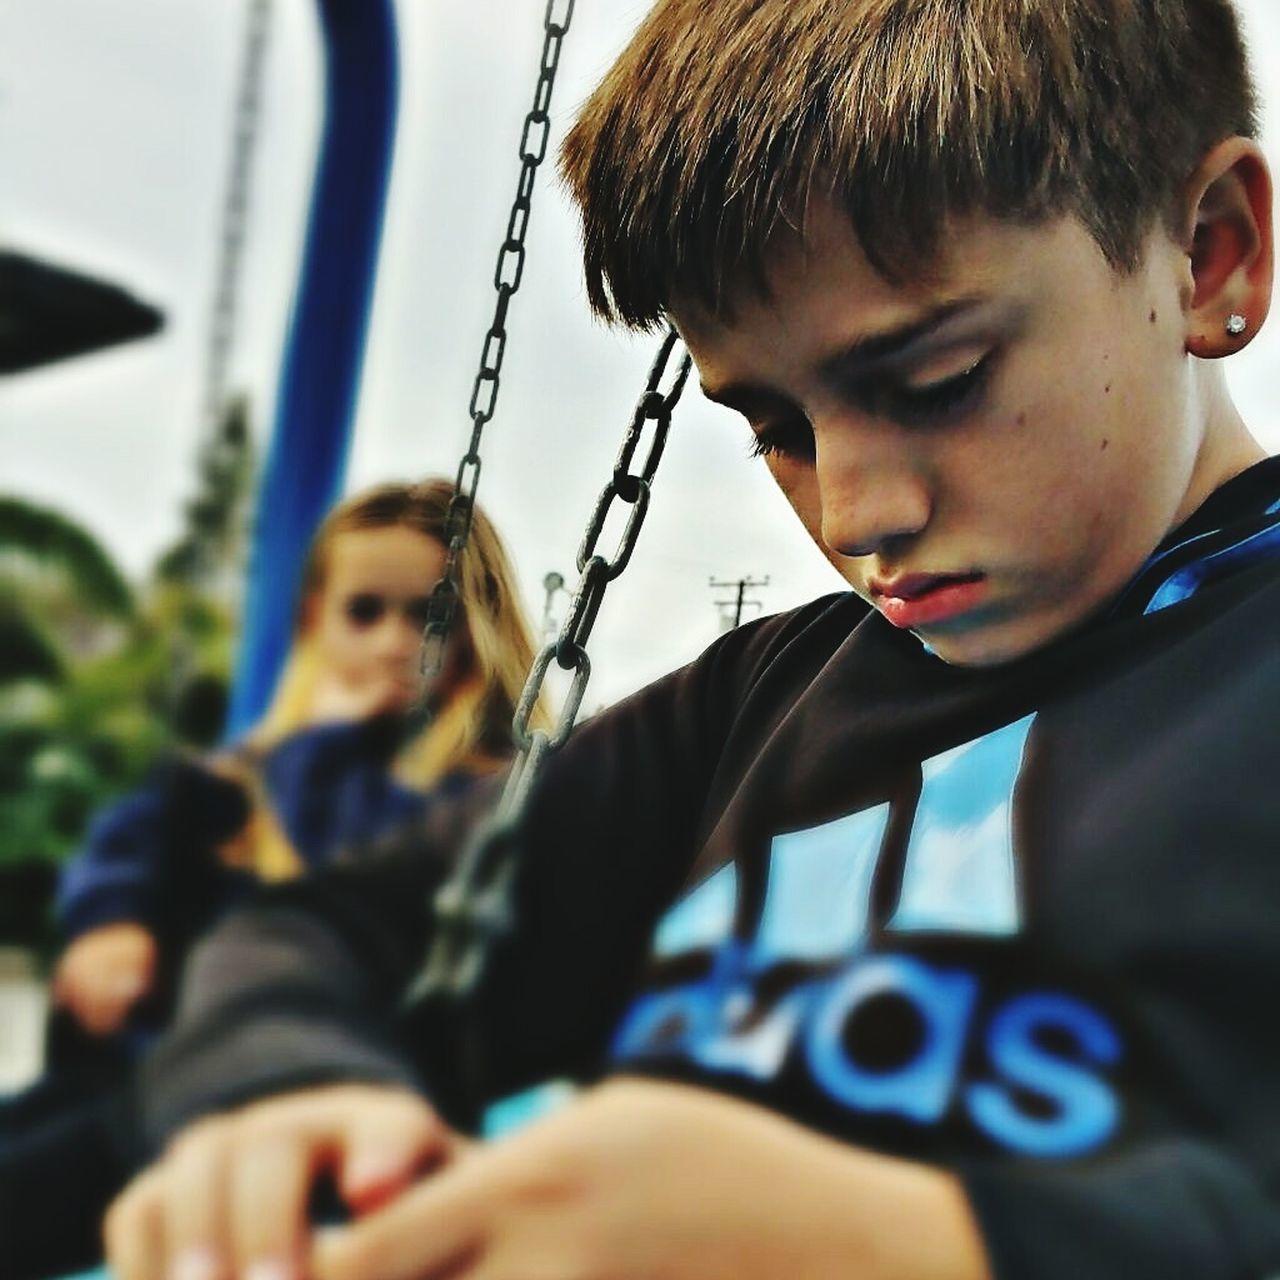 Child Childhood Son FatherSonMoments True Love Bitter-Sweet The Park Swinging Technology Electronics  Games Separation Sadness😢 Godrules Jesus Christ My Savior